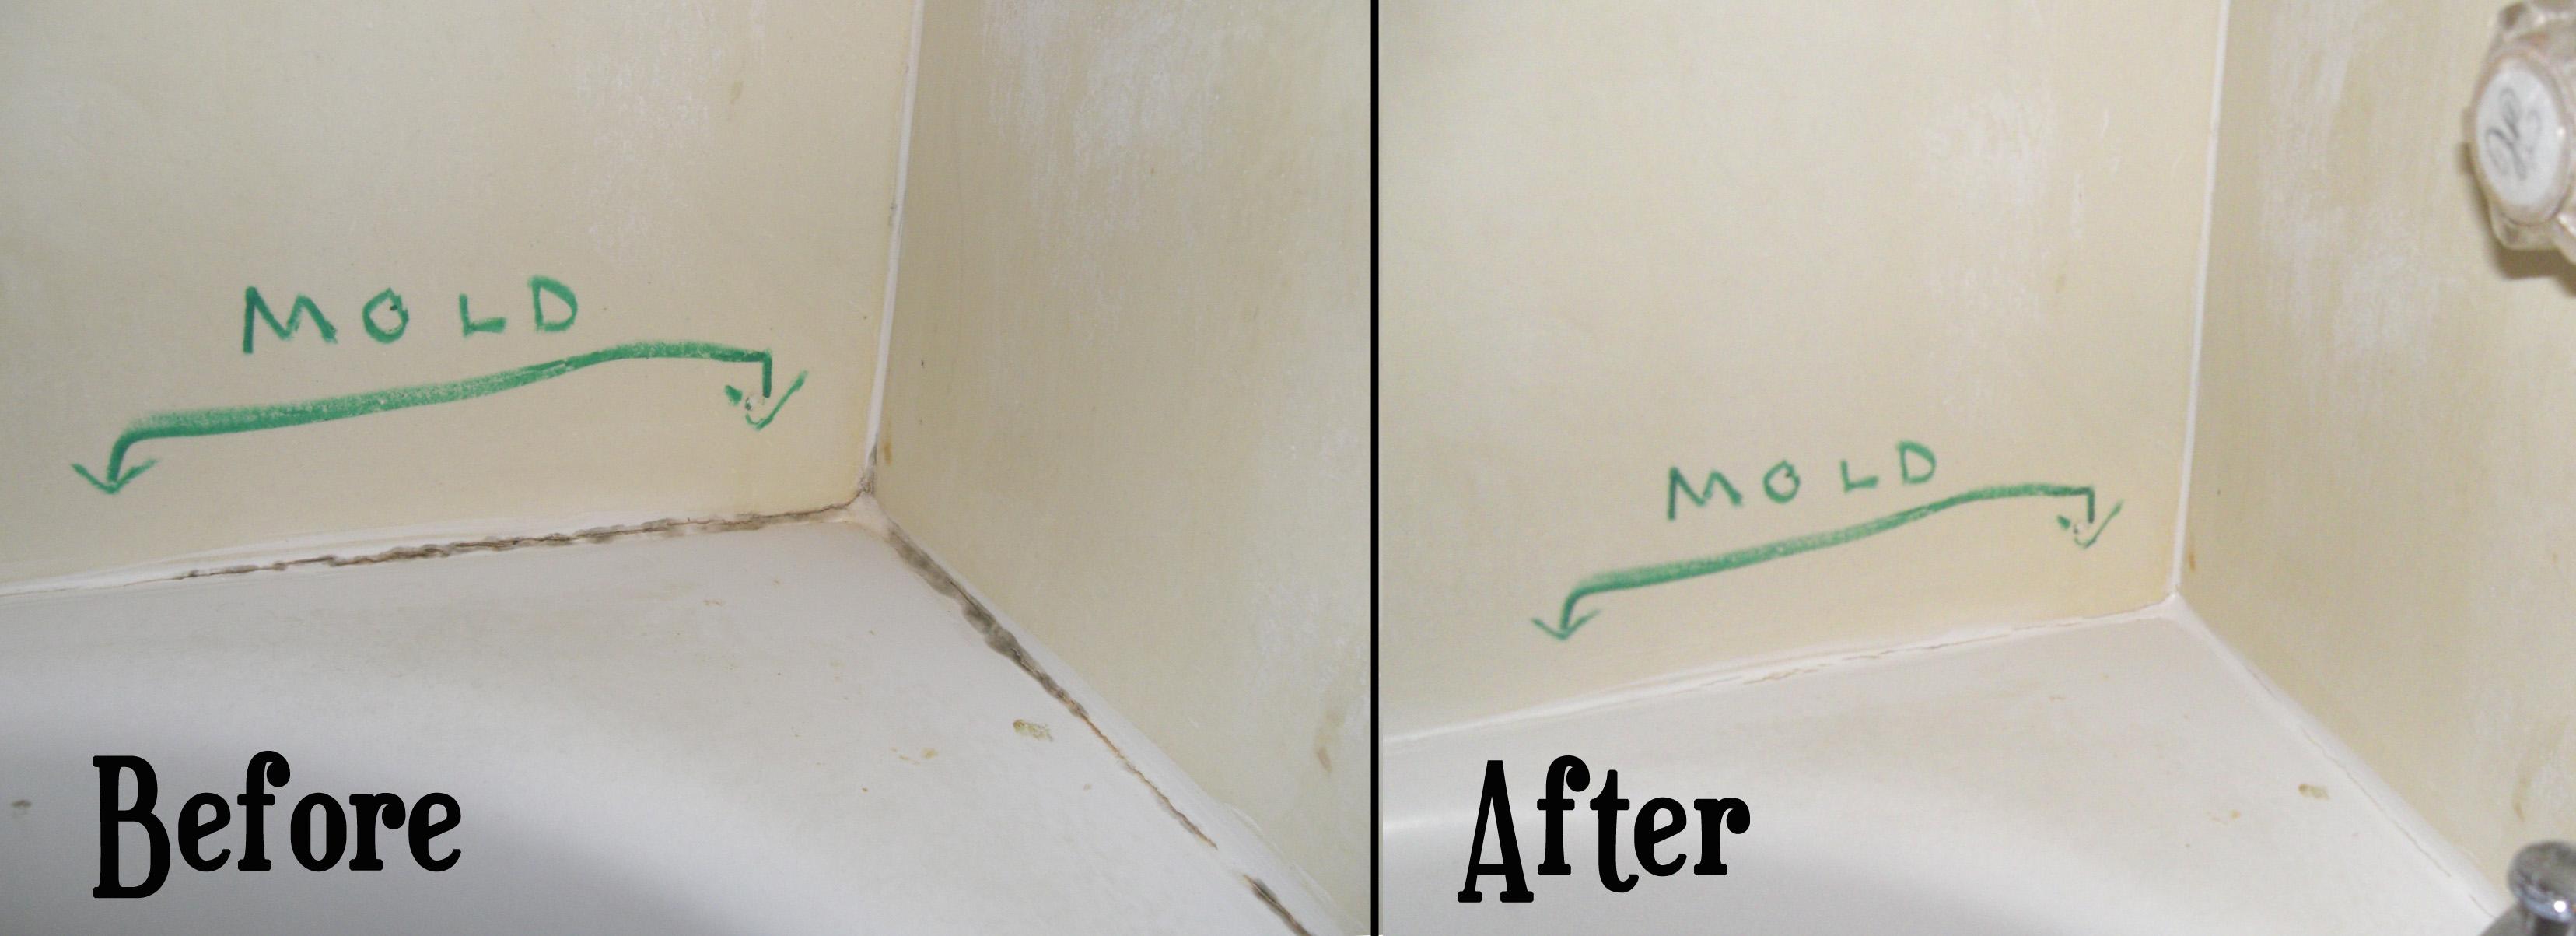 Flashback Cleaning Mold Stains From Bathtub Caulk